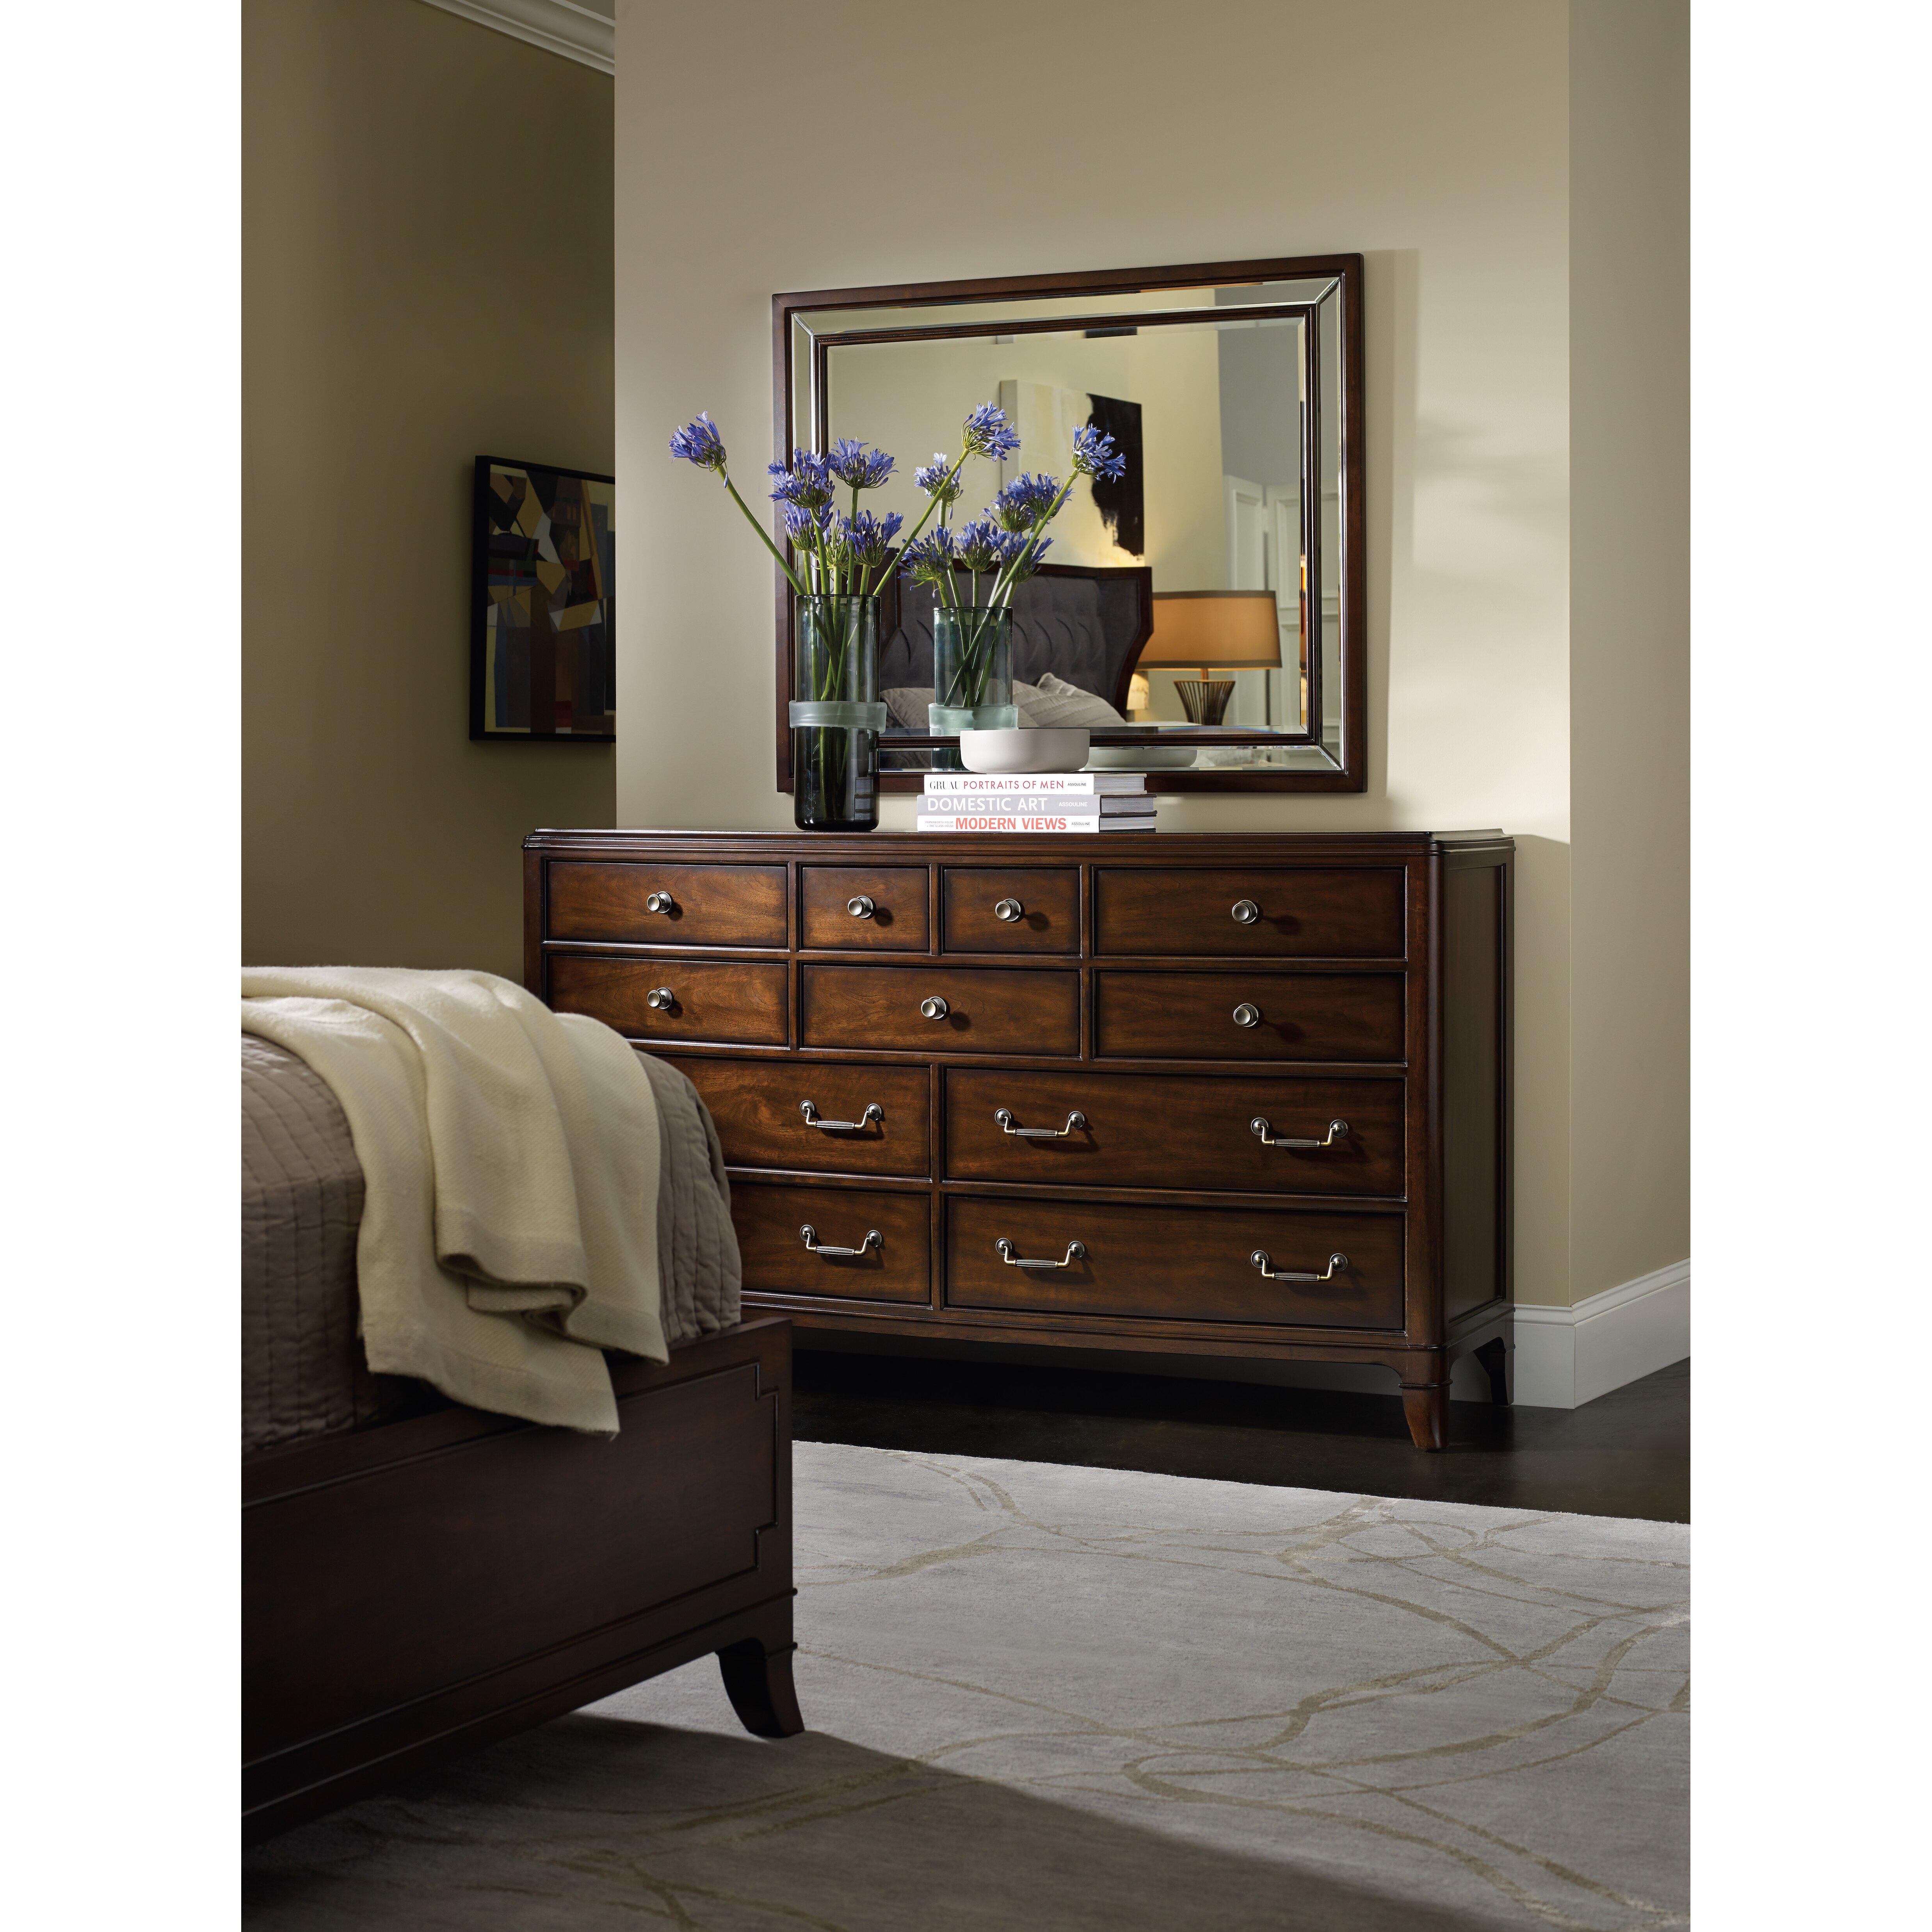 Hooker Furniture Palisade 11 Drawer Dresser & Reviews